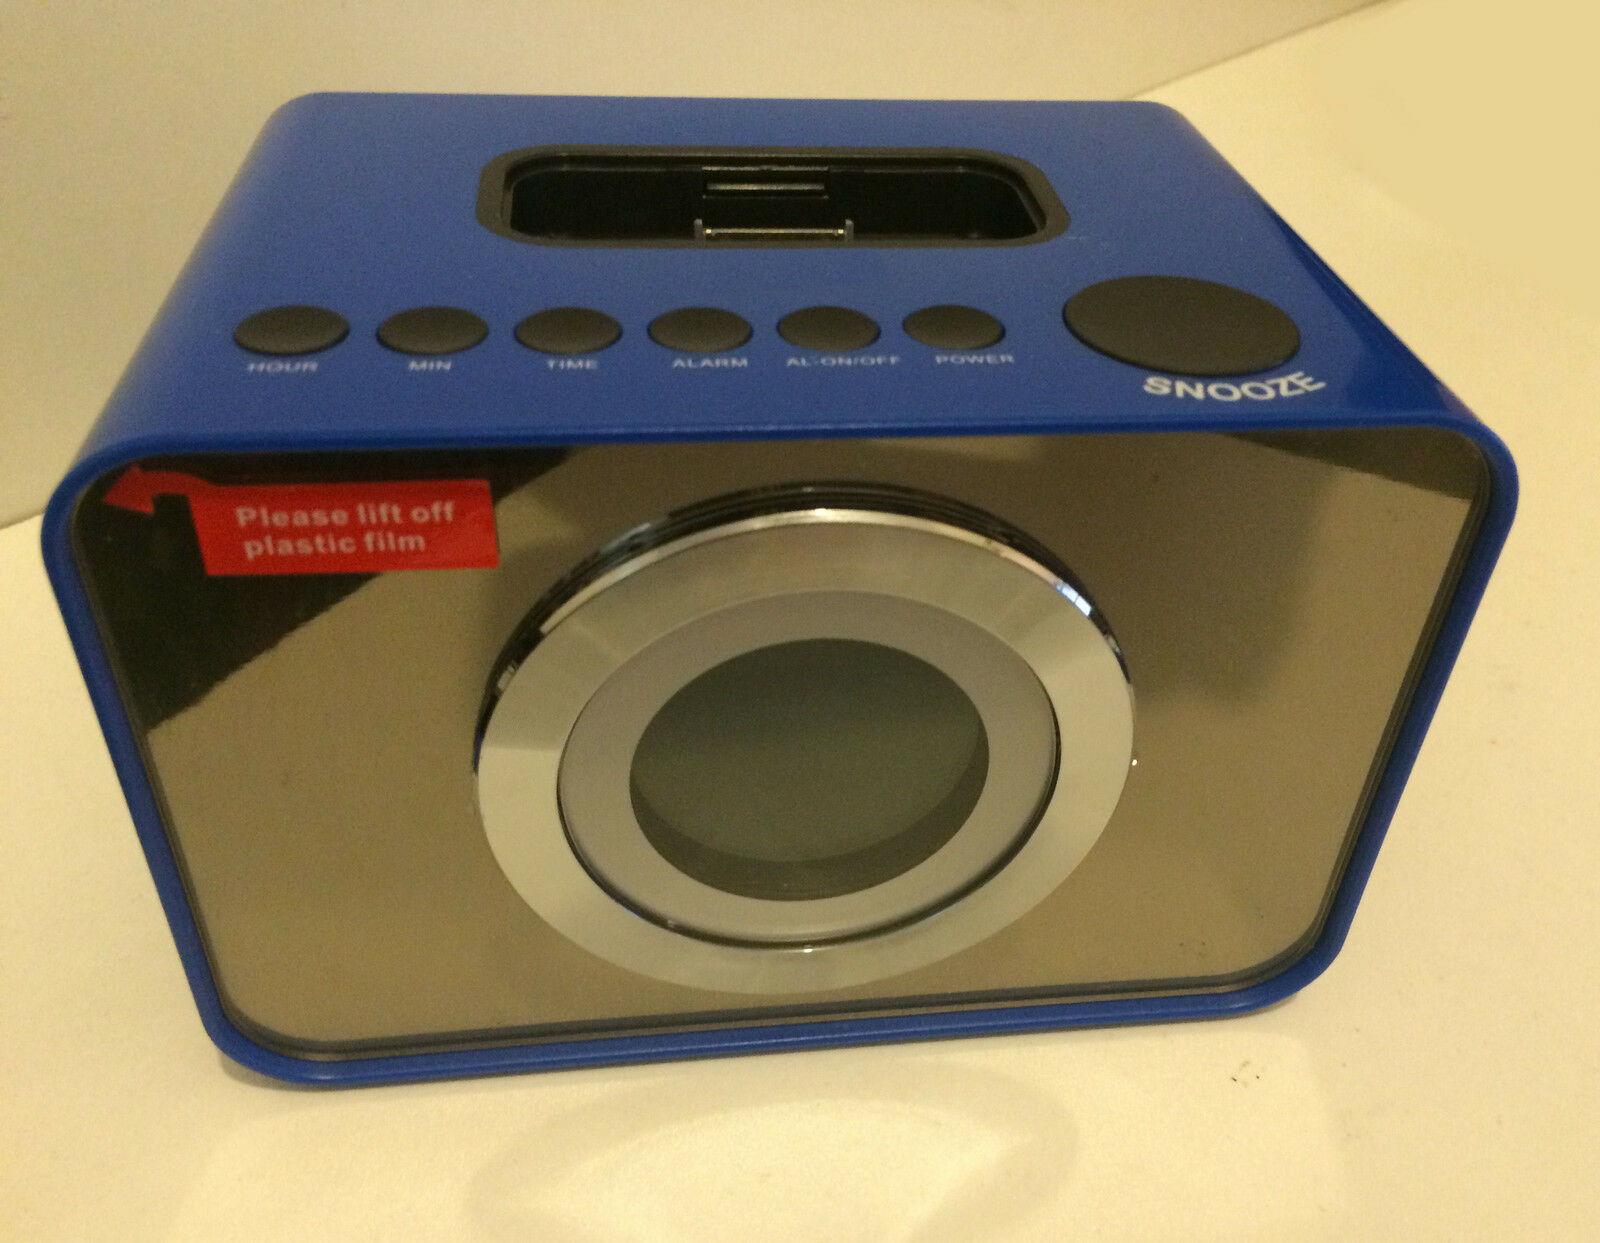 Curtis Ip288ukt Blue Digital Radio Alarm Clock Ipod Docking Station Amfm Snooze